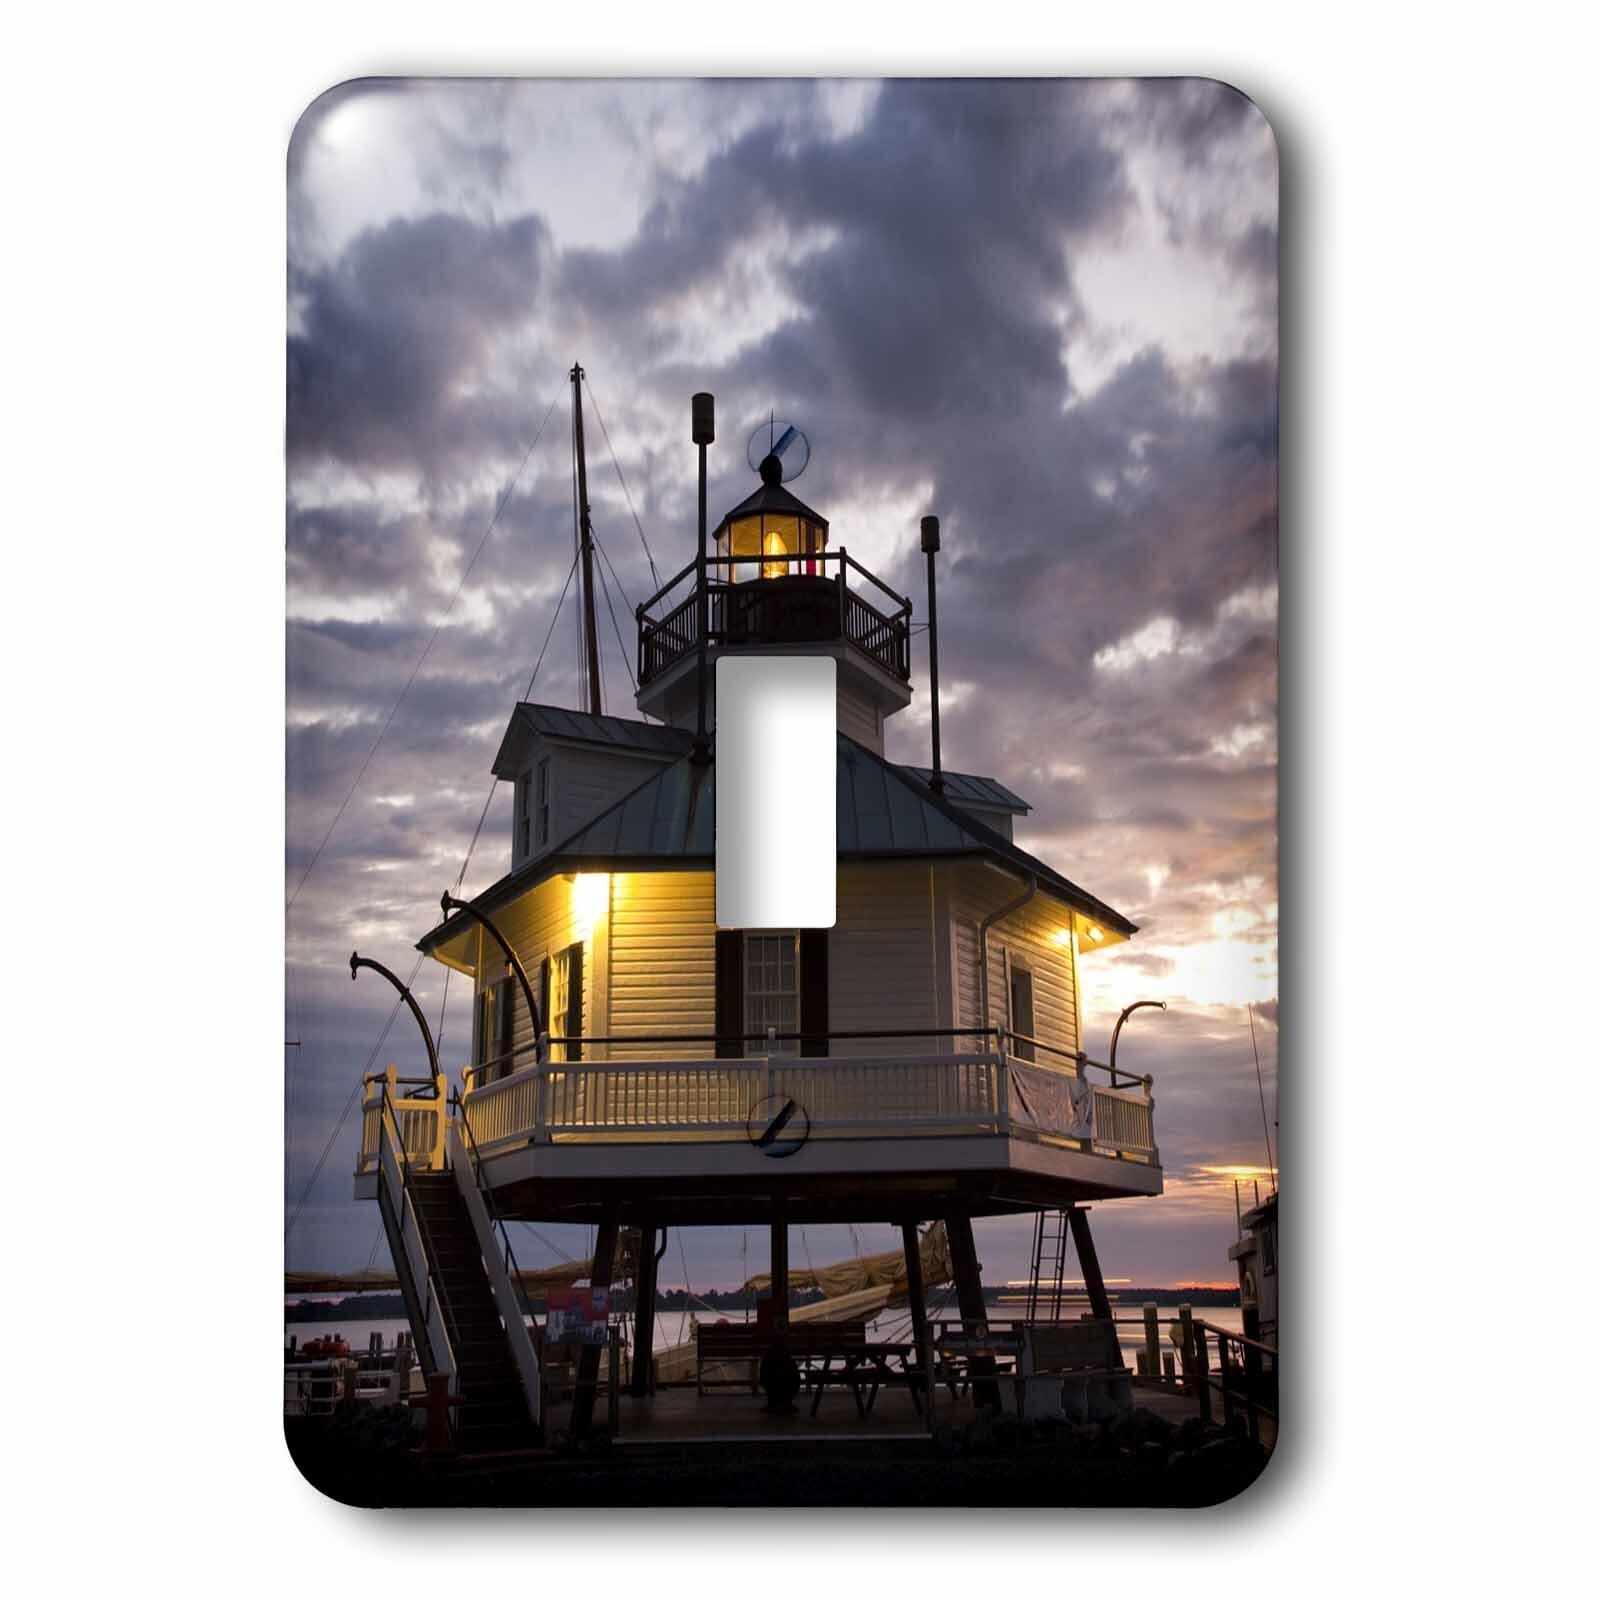 3drose Chesapeake Bay Hooper Straight Lighthouse 1 Gang Toggle Light Switch Wall Plate Wayfair